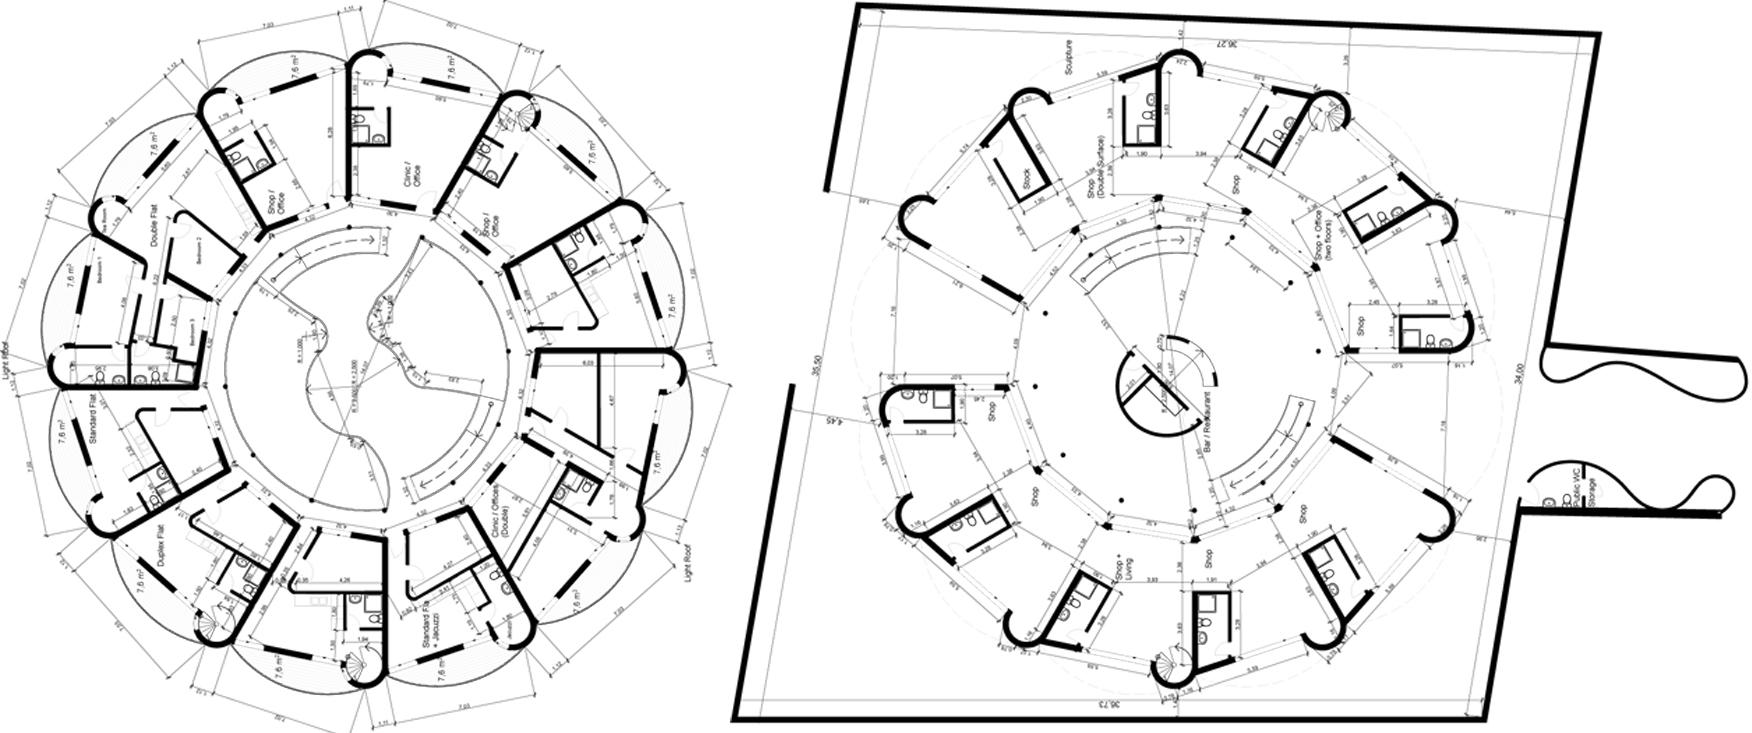 feng shui ground dbs architectes. Black Bedroom Furniture Sets. Home Design Ideas